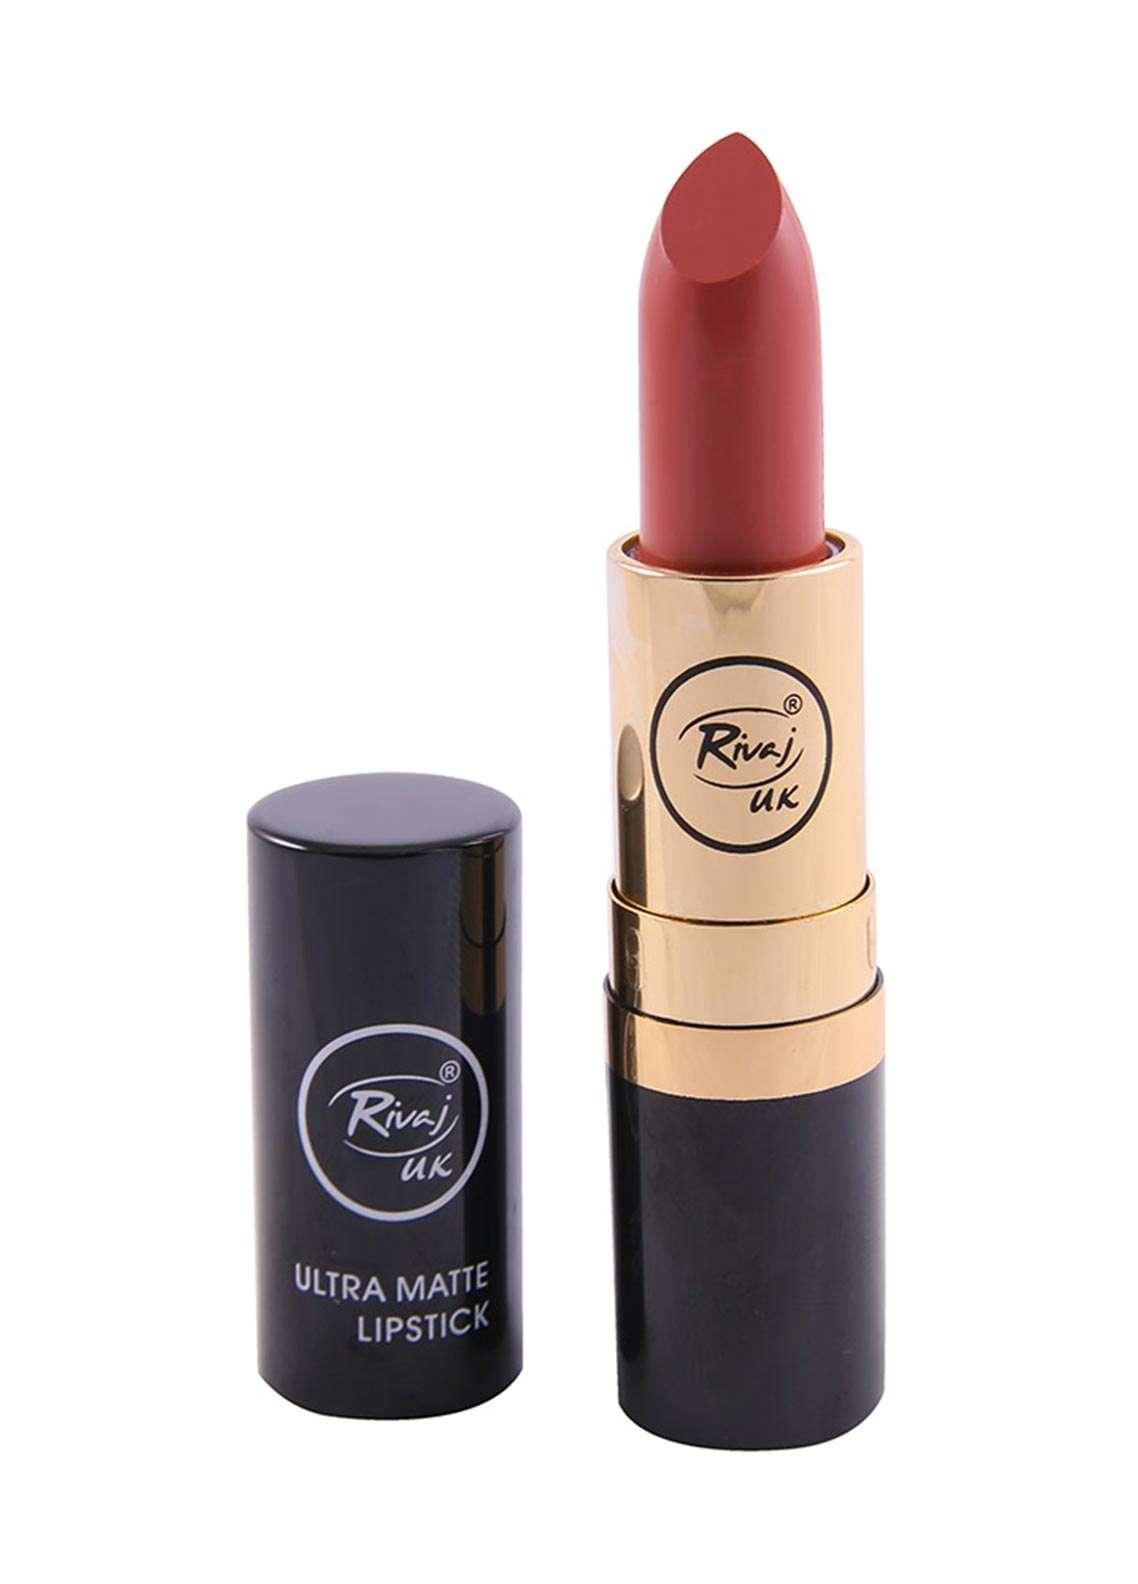 Rivaj UK Ultra Matte Lipstick - 25